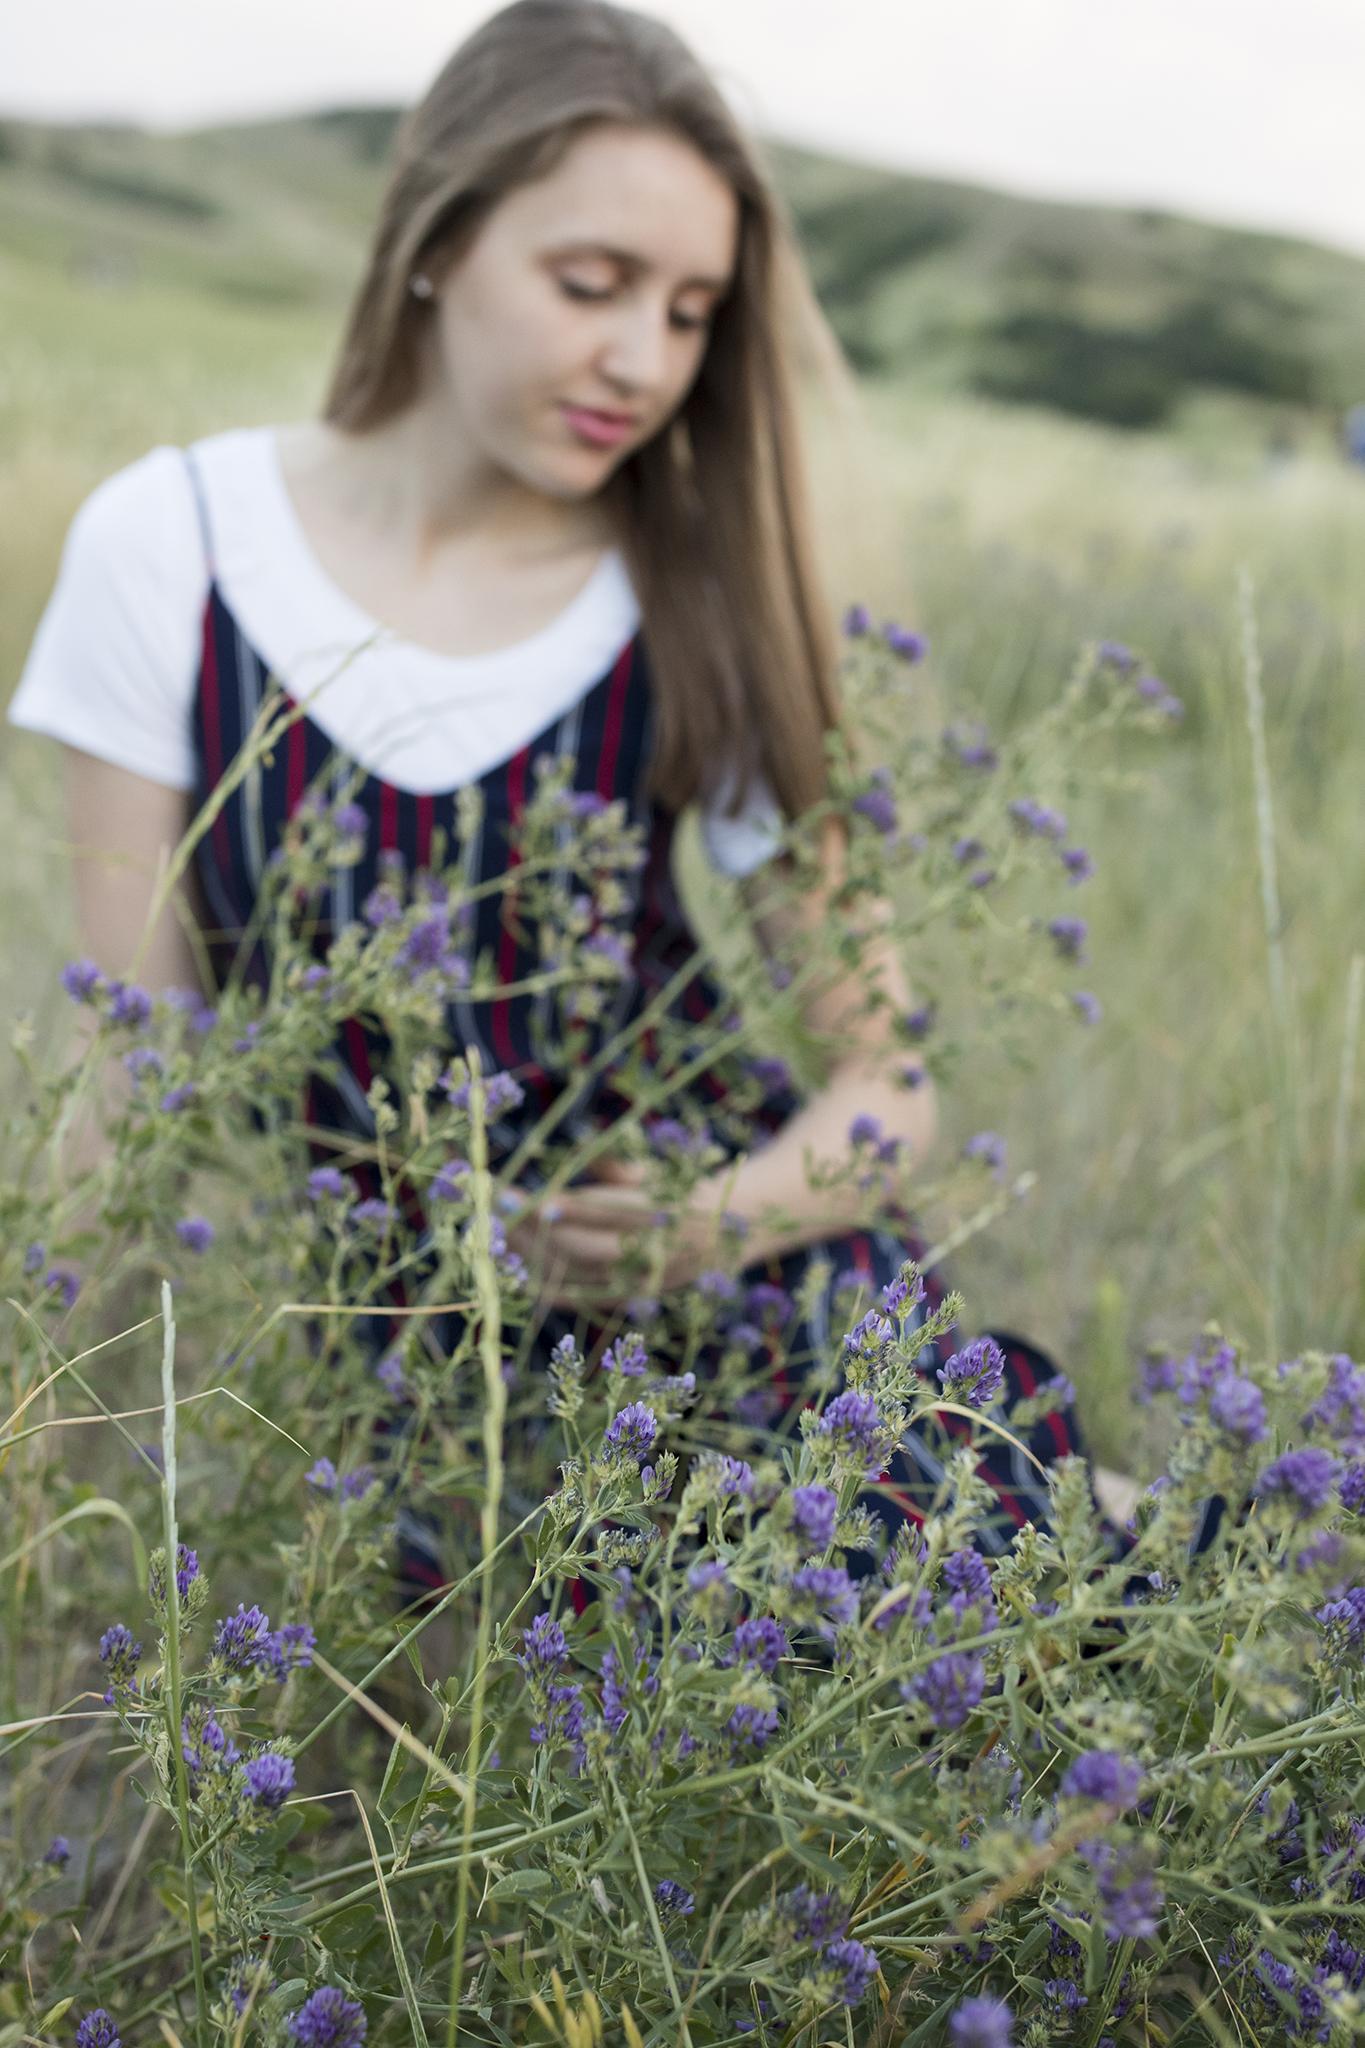 senior-portraits-in-flowers.jpg